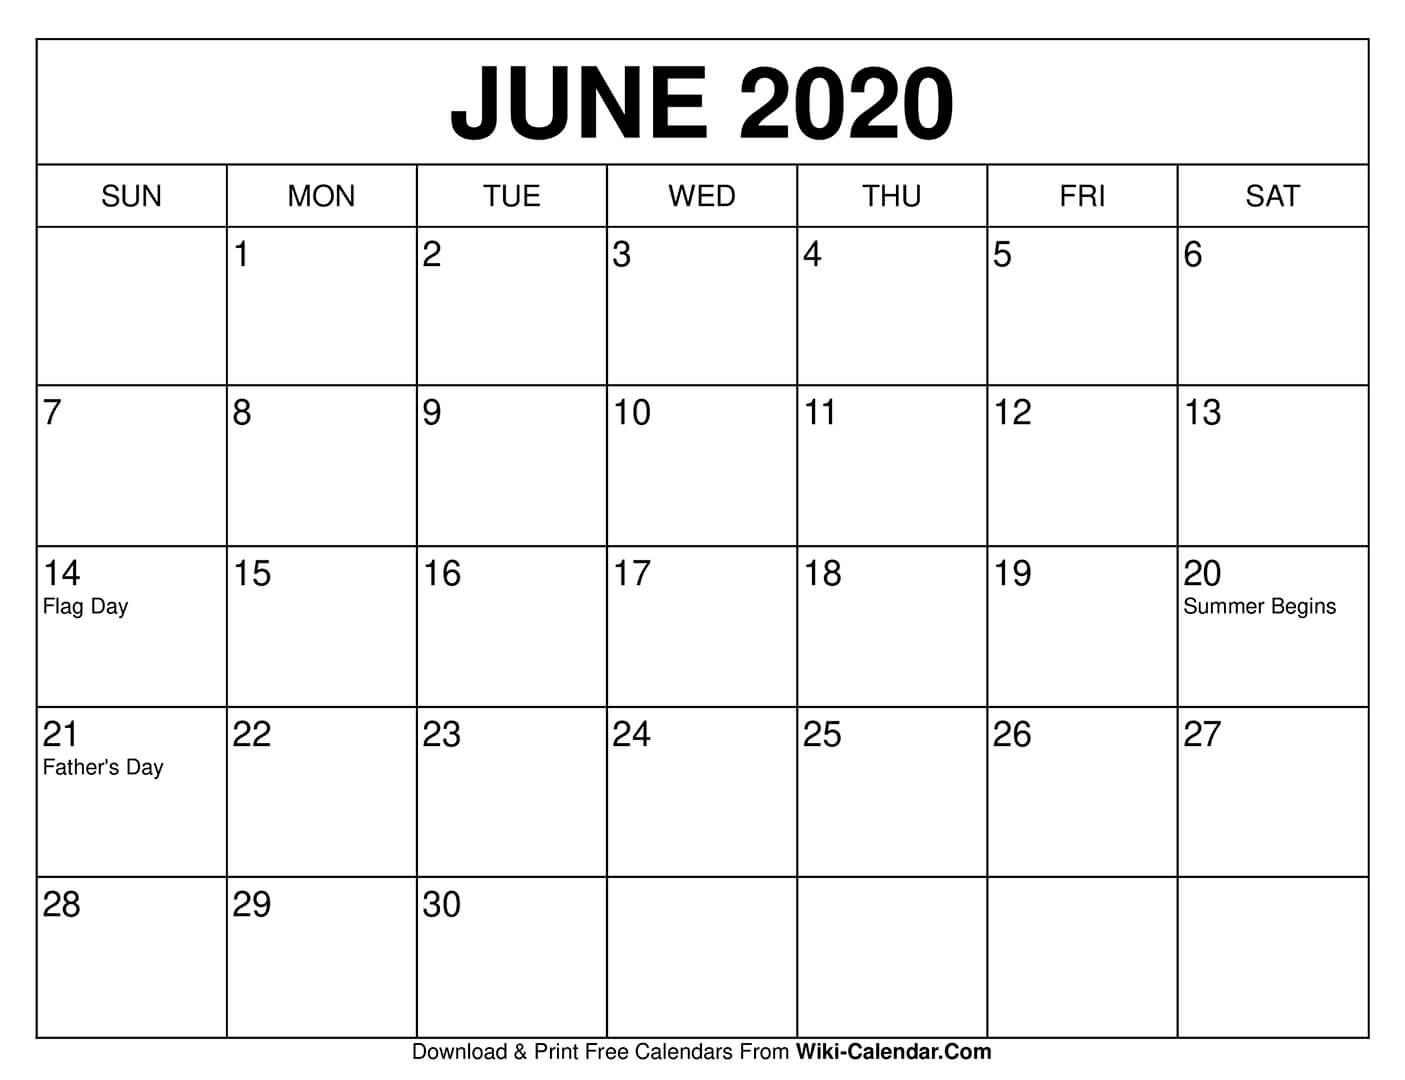 Free Printable June 2020 Calendars pertaining to 2020 Calendar Printable Free Pdf Color